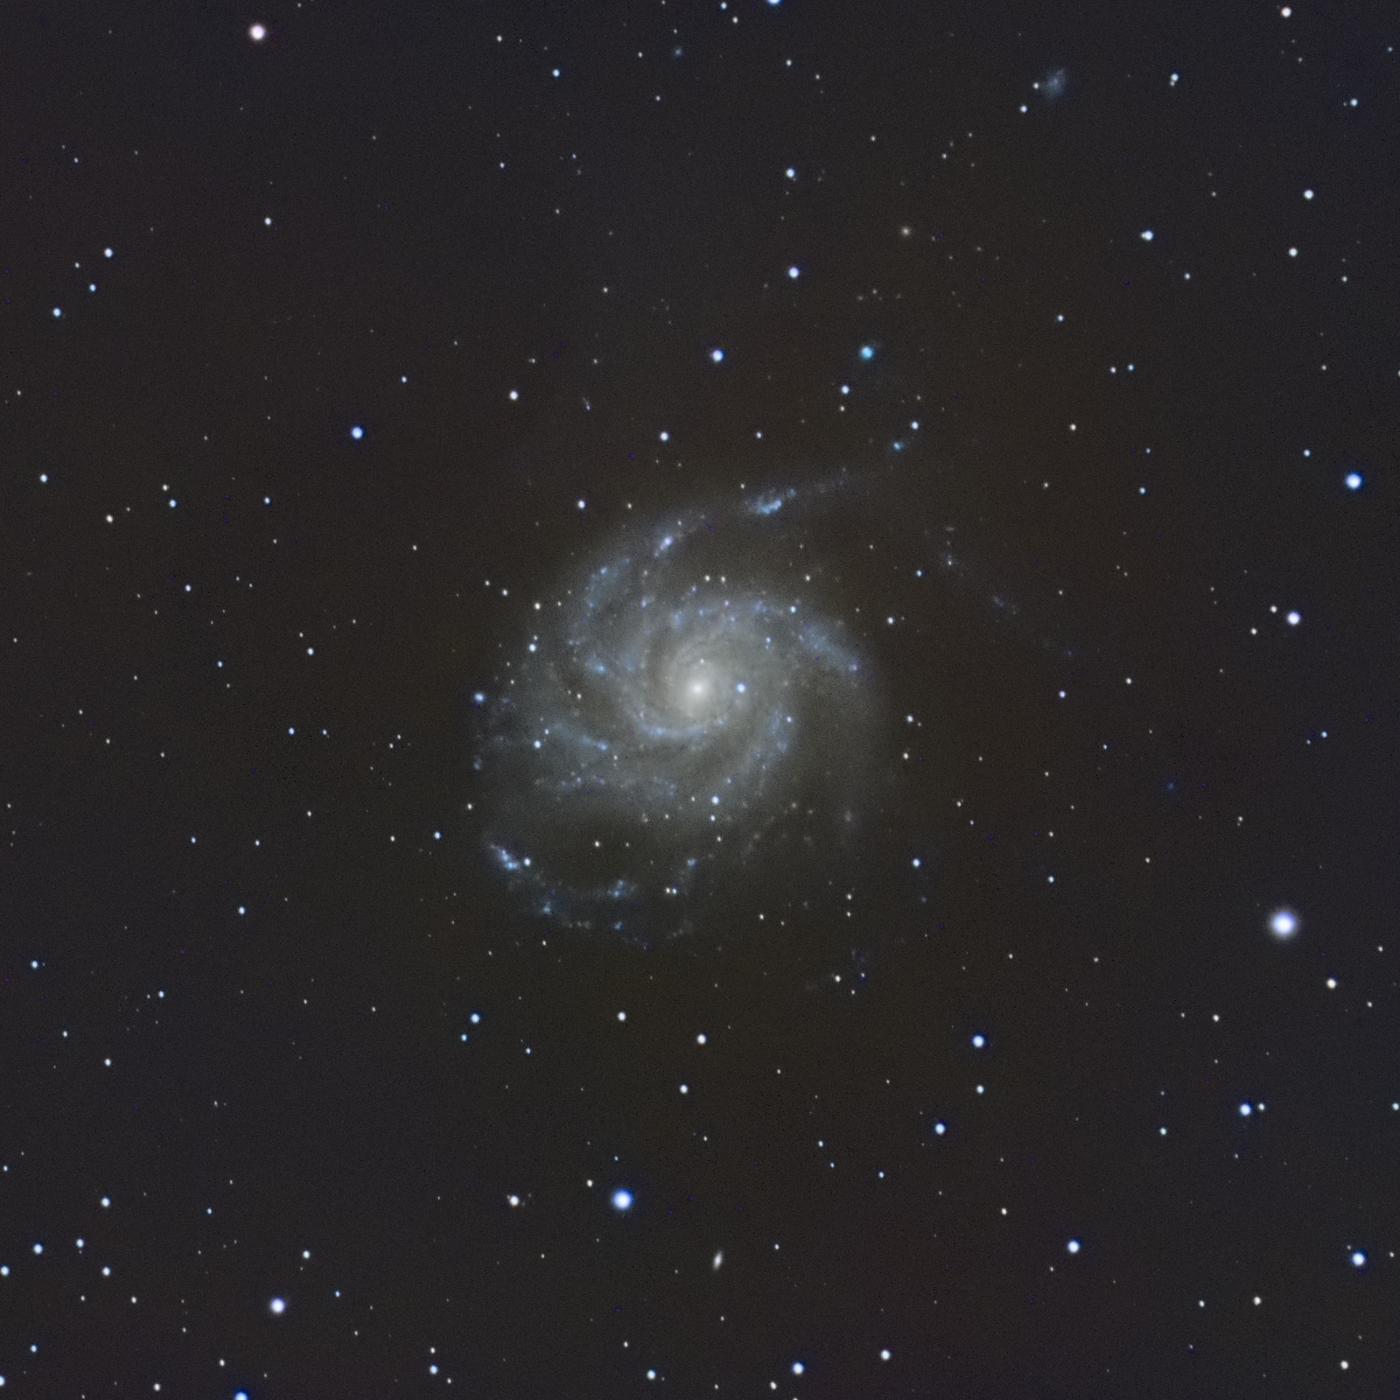 La galaxie M101